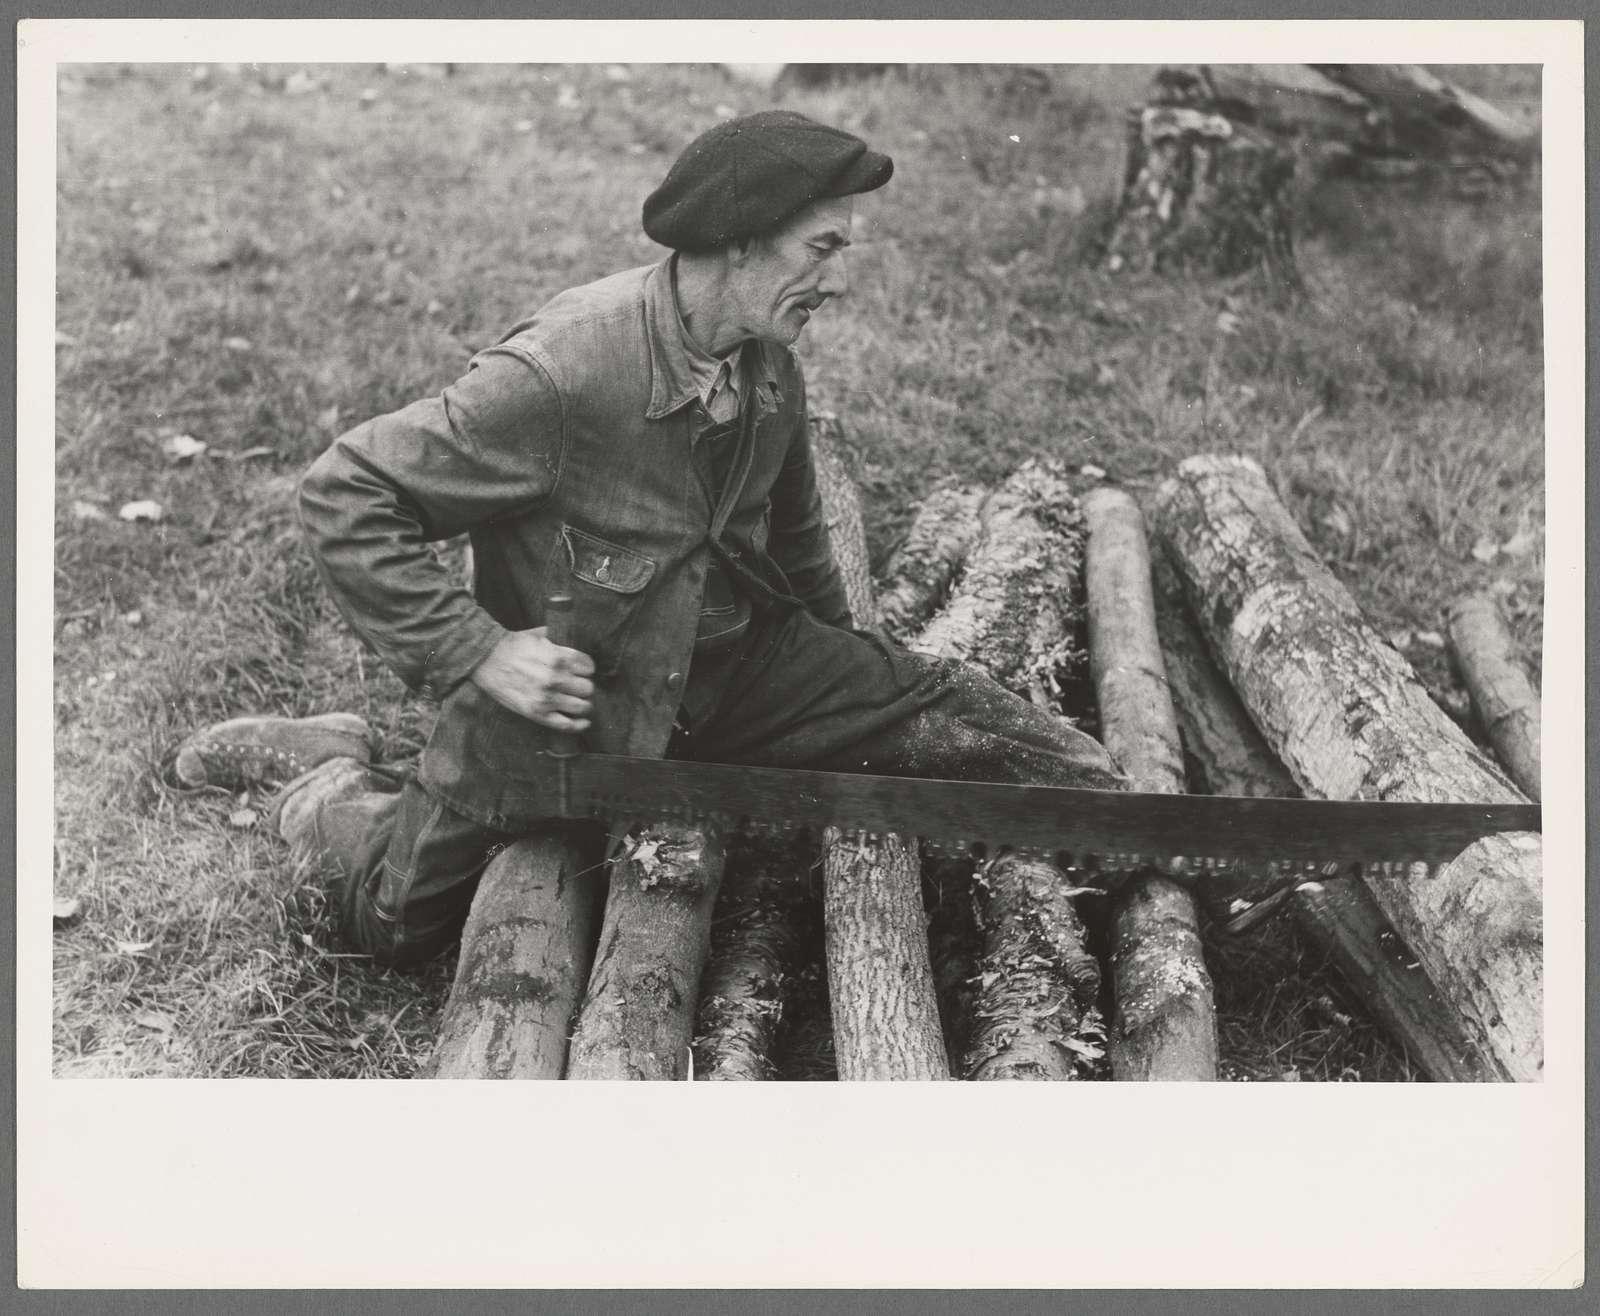 Farmer sawing wood near Bradford, Vermont